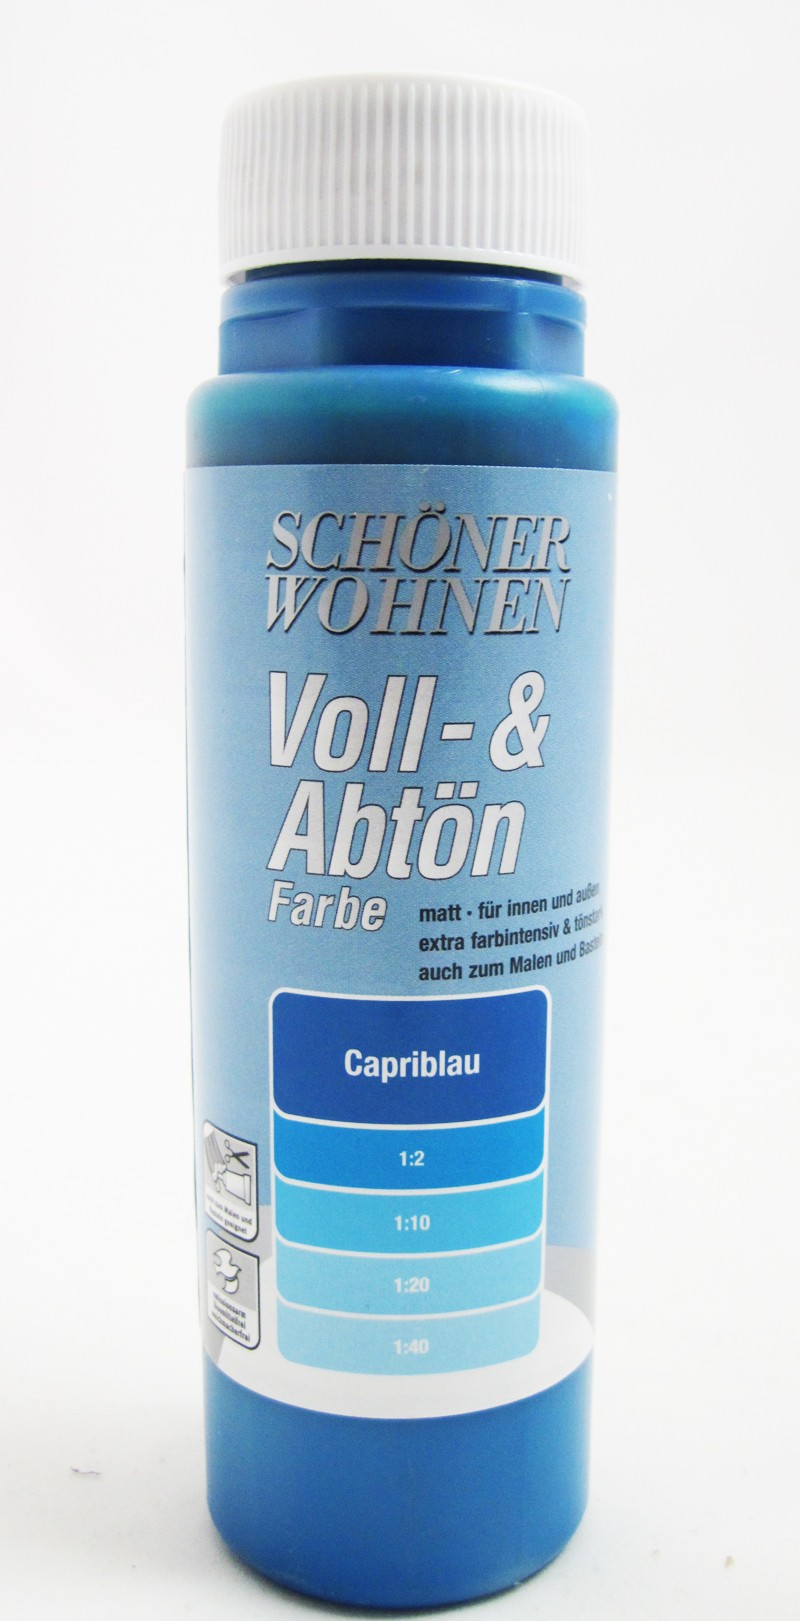 Voll- und Abtönfarbe Capriblau 500 ml